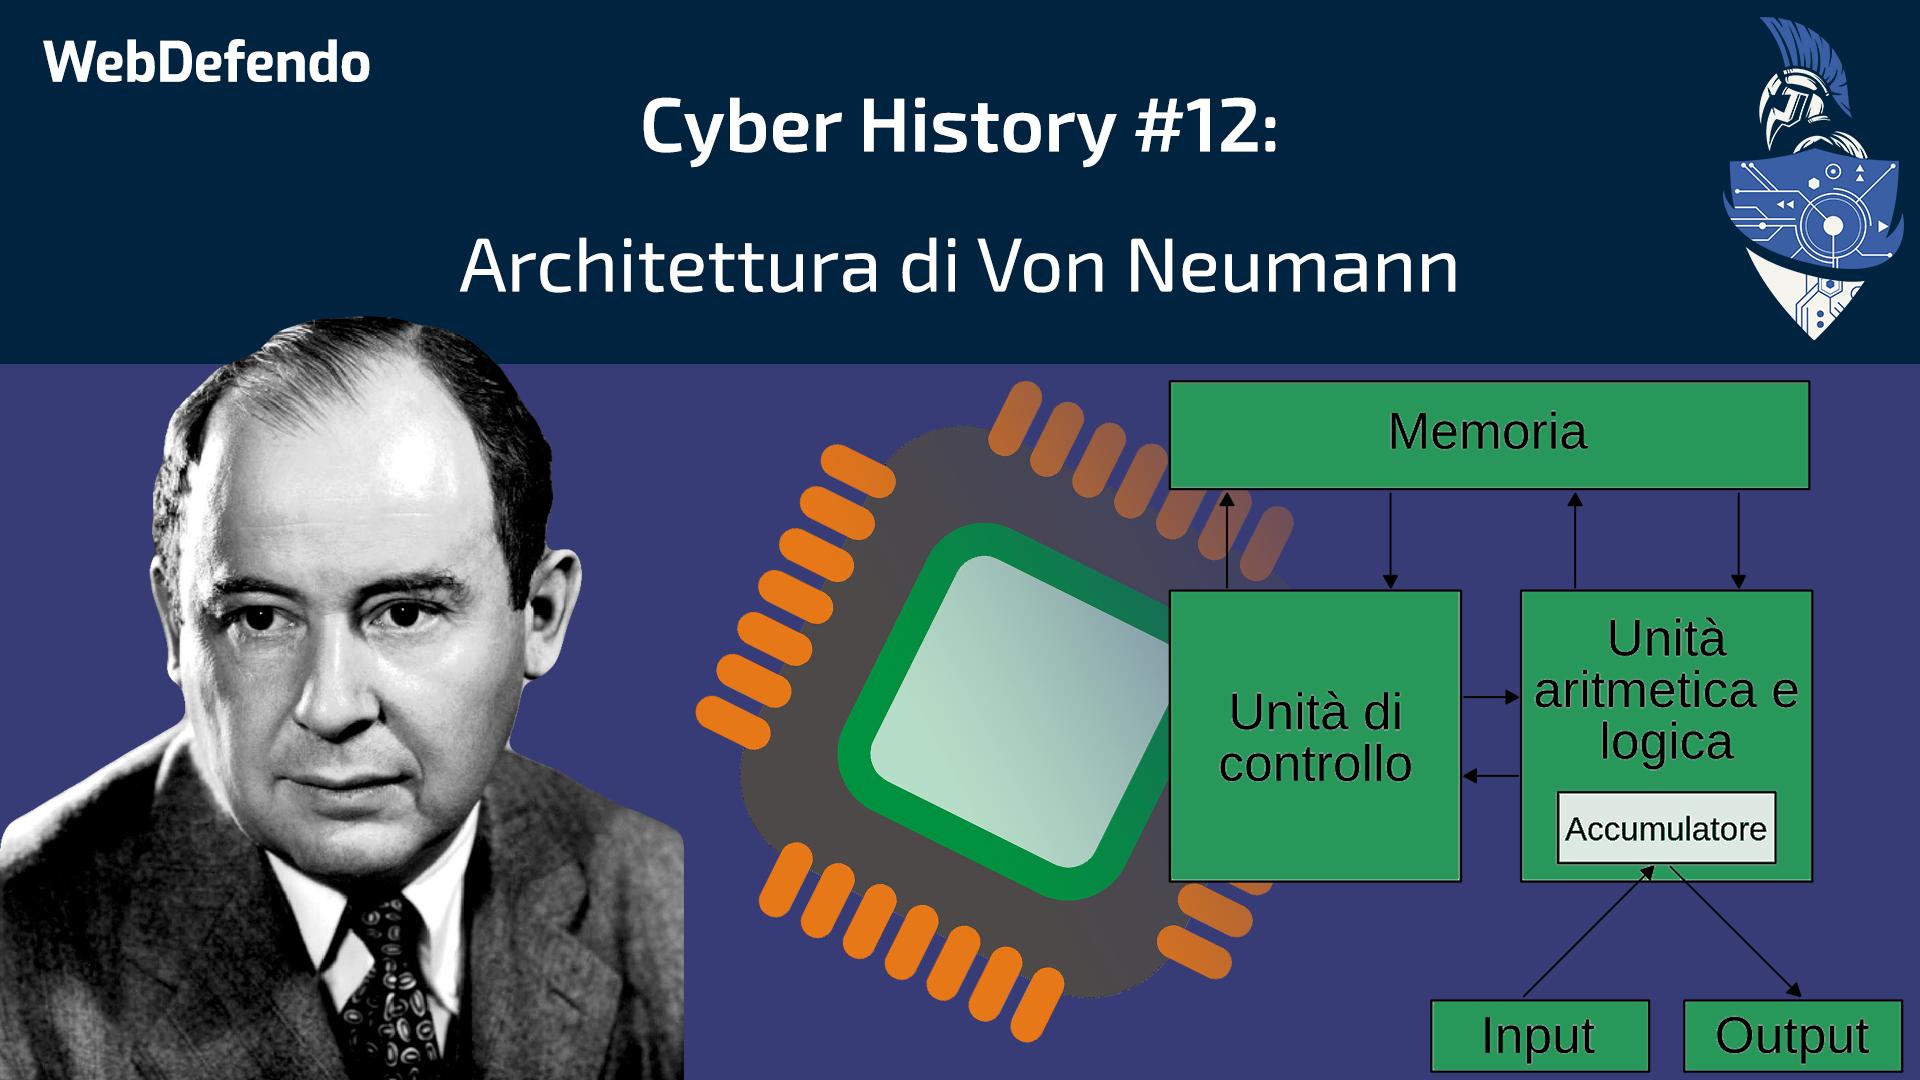 CyberHistory #12: Architettura di Von Neumann